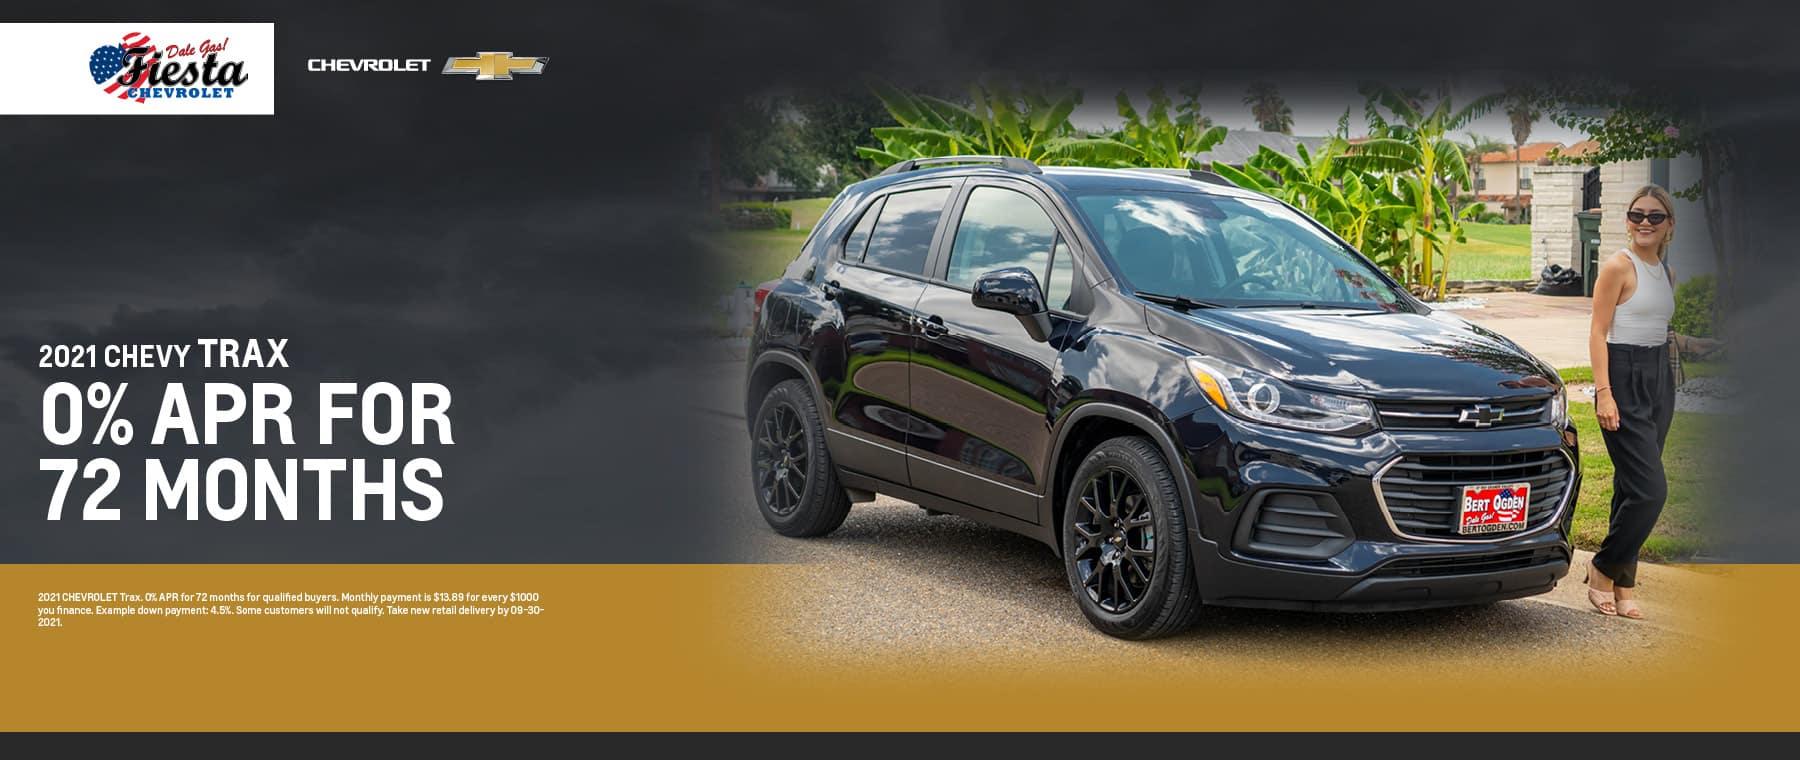 2021 Chevrolet Trax APR Offer | Fiesta Chevrolet in Edinburg, Texas